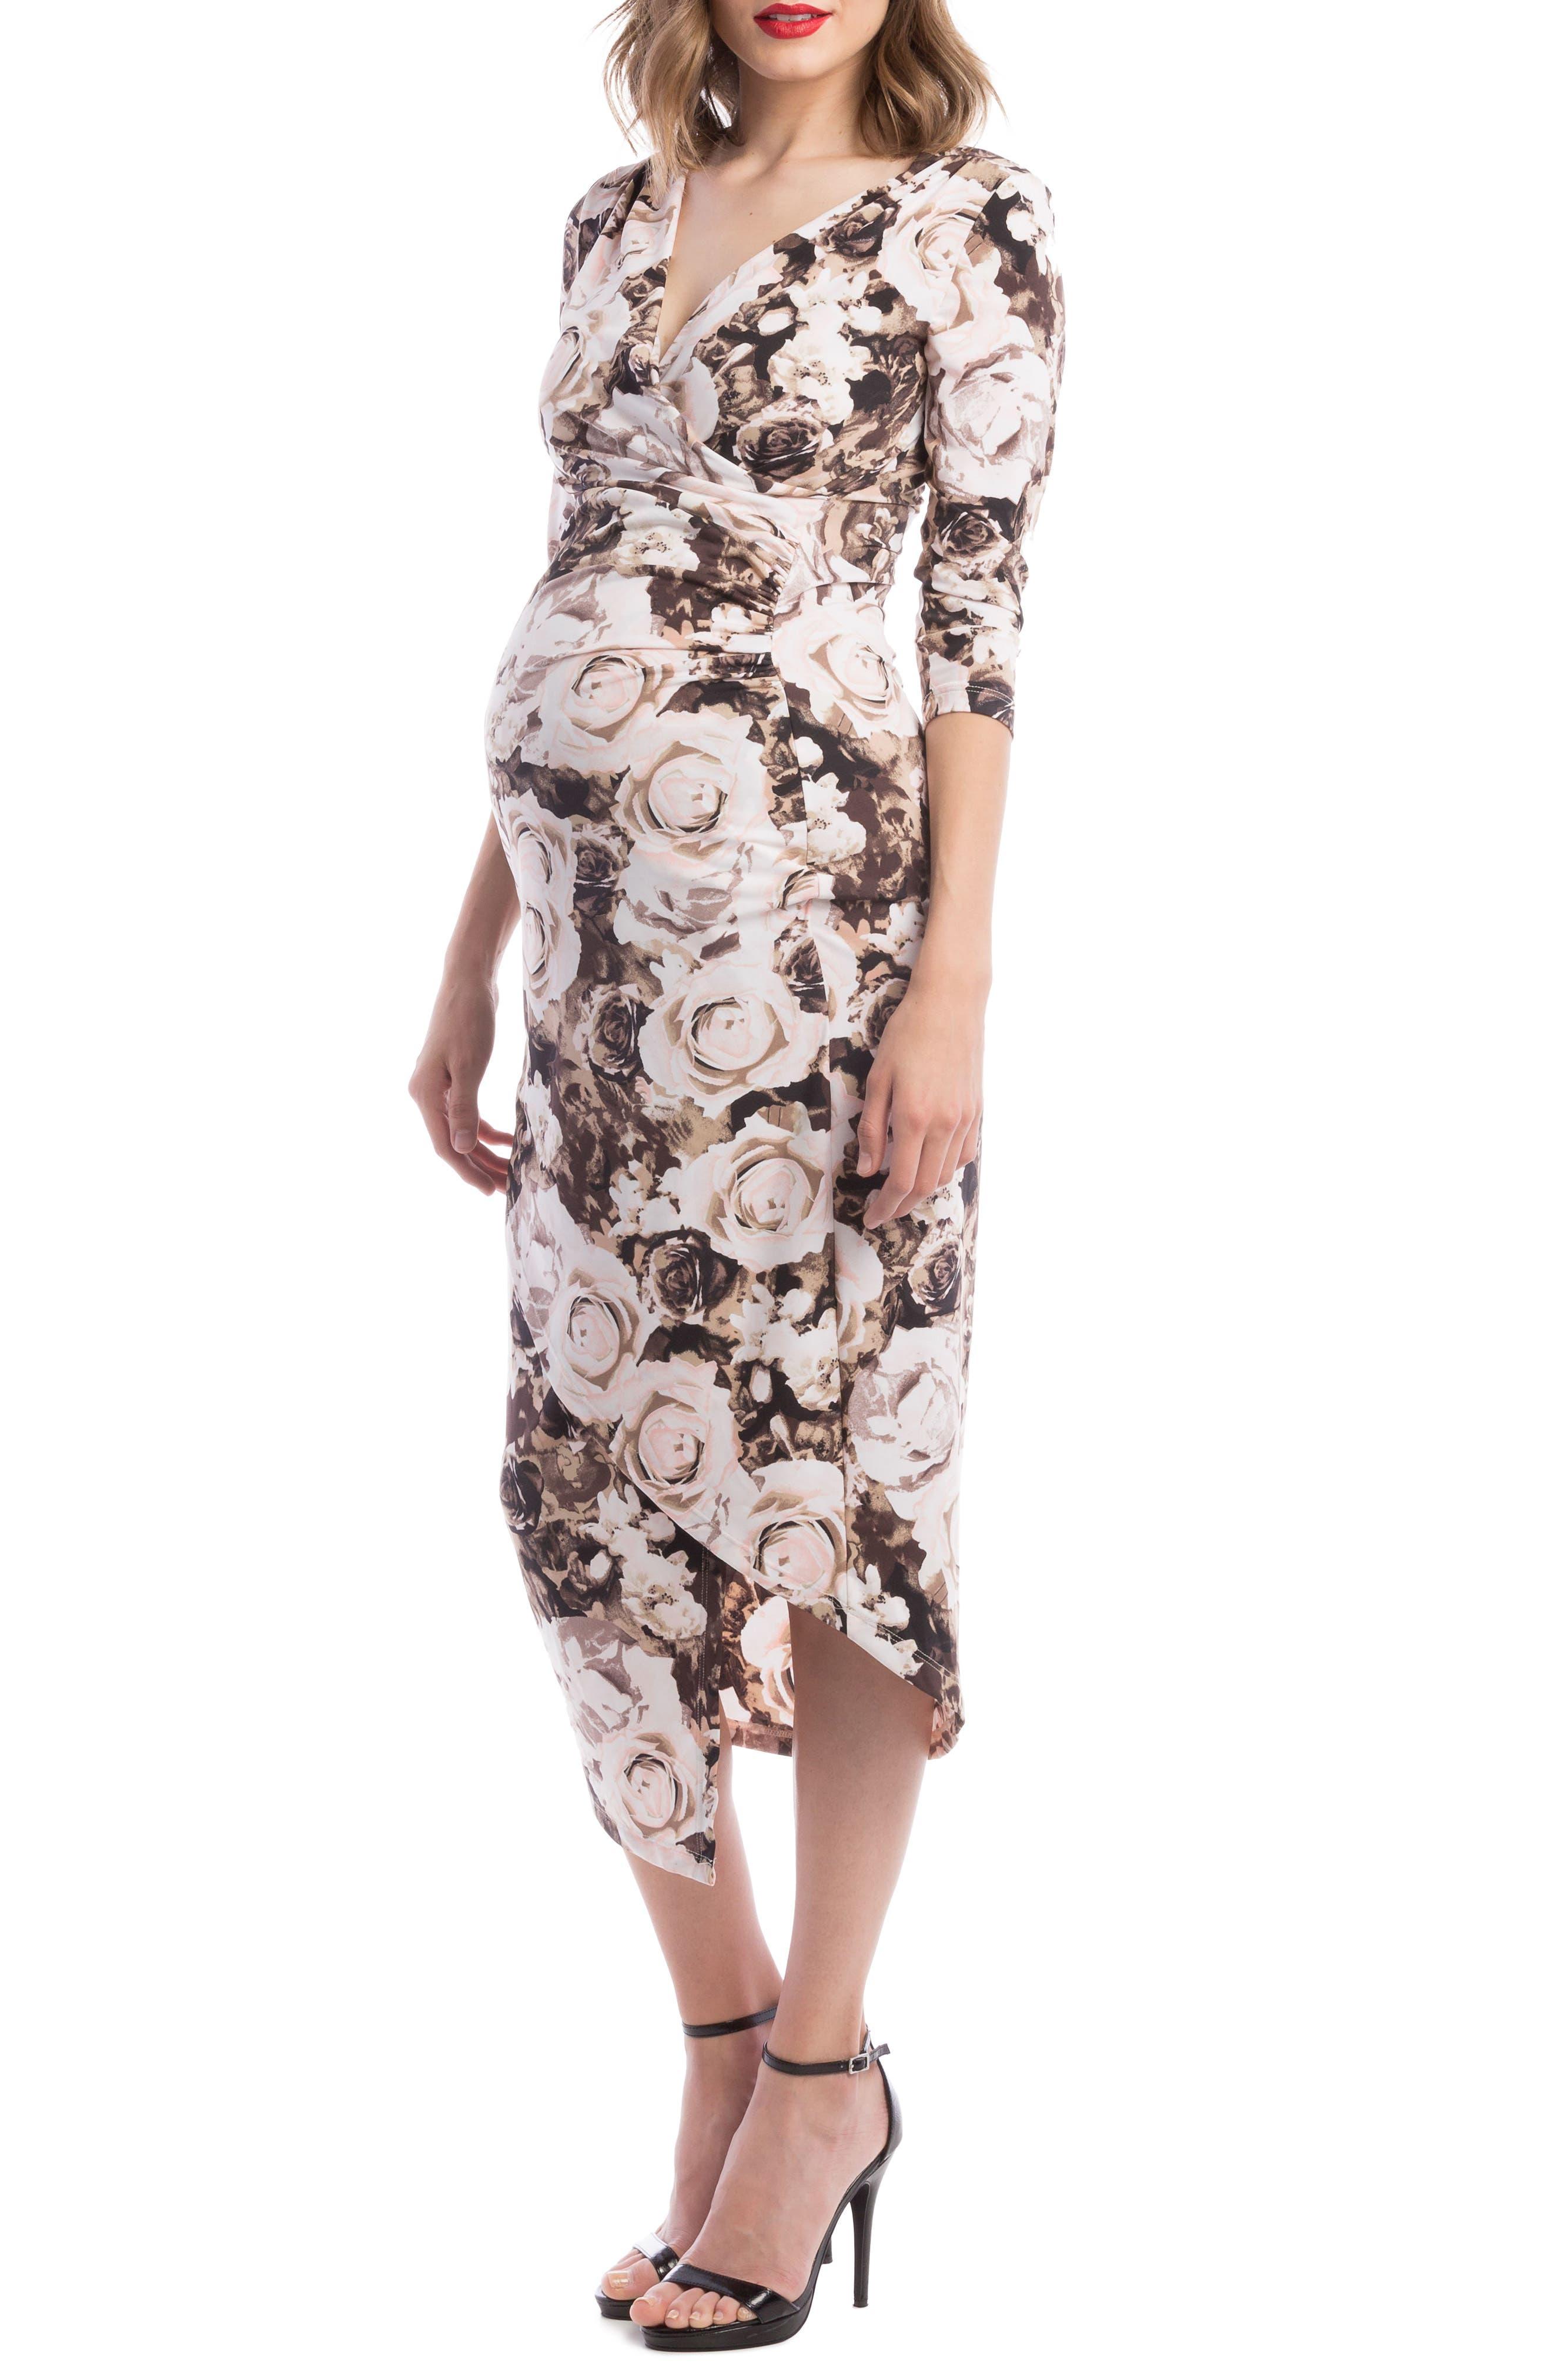 Alternate Image 1 Selected - Lilac Clothing Carly Faux Wrap Maternity/Nursing Dress